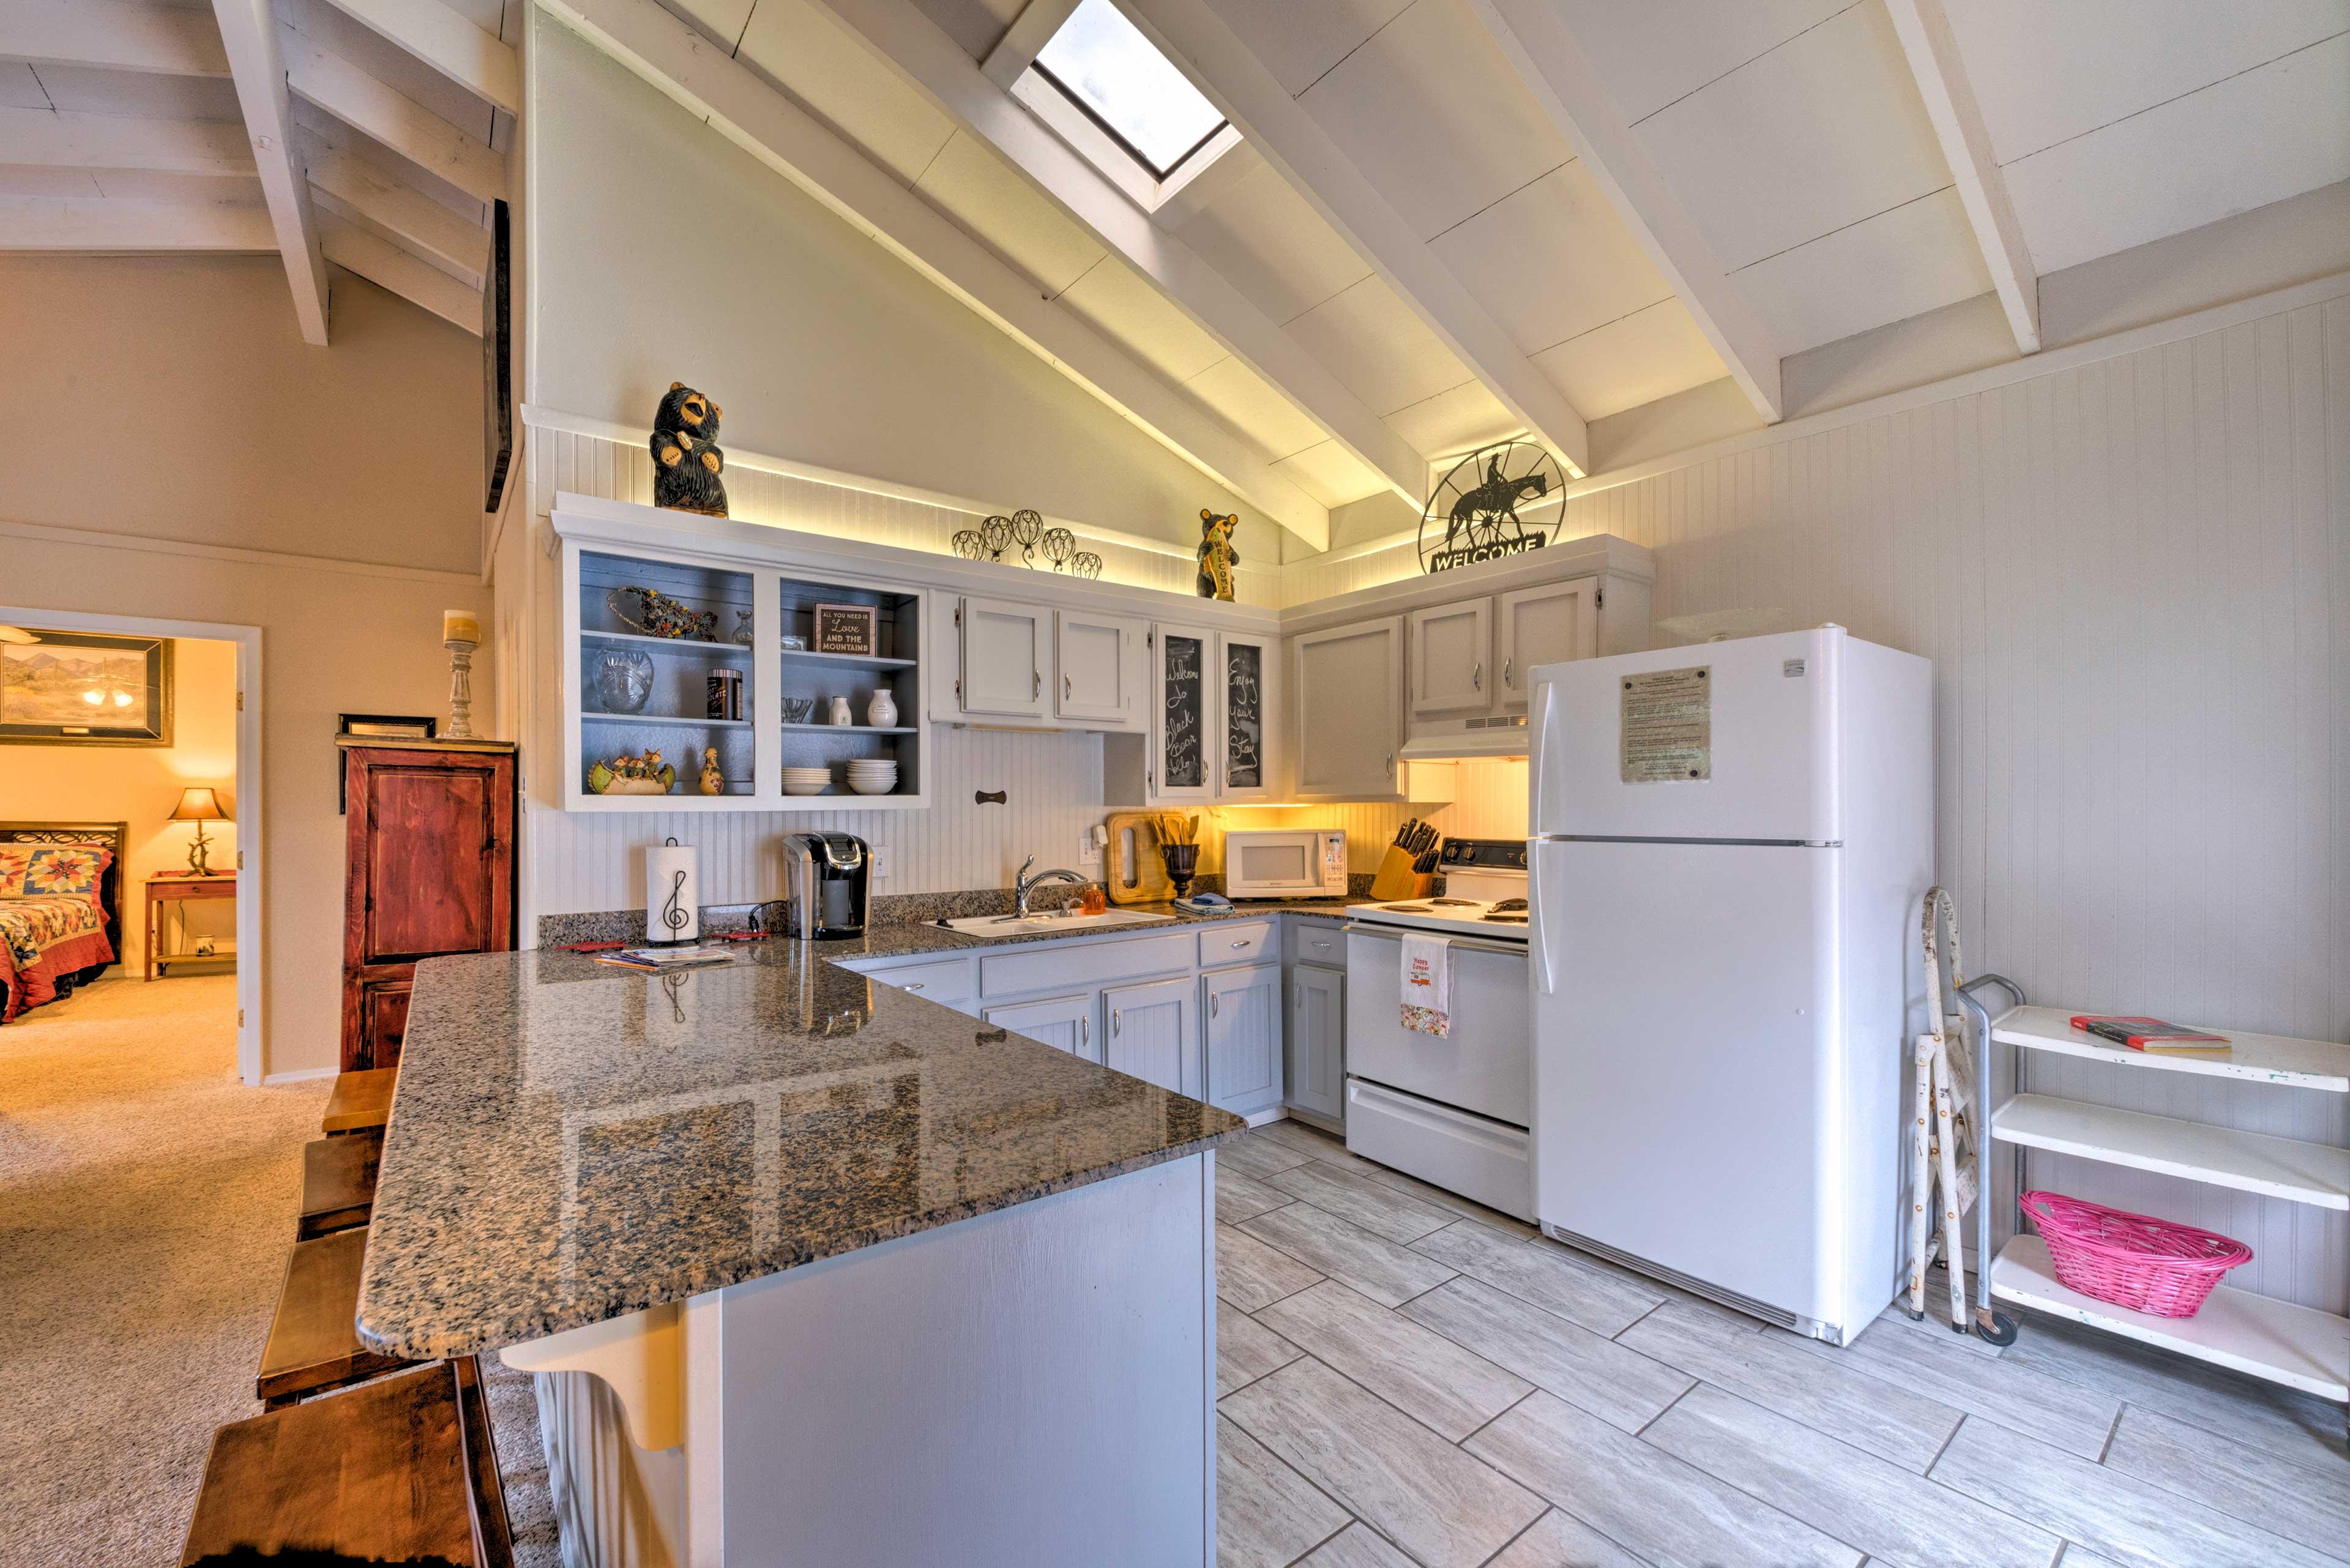 Prepare a meal on the granite countertops.